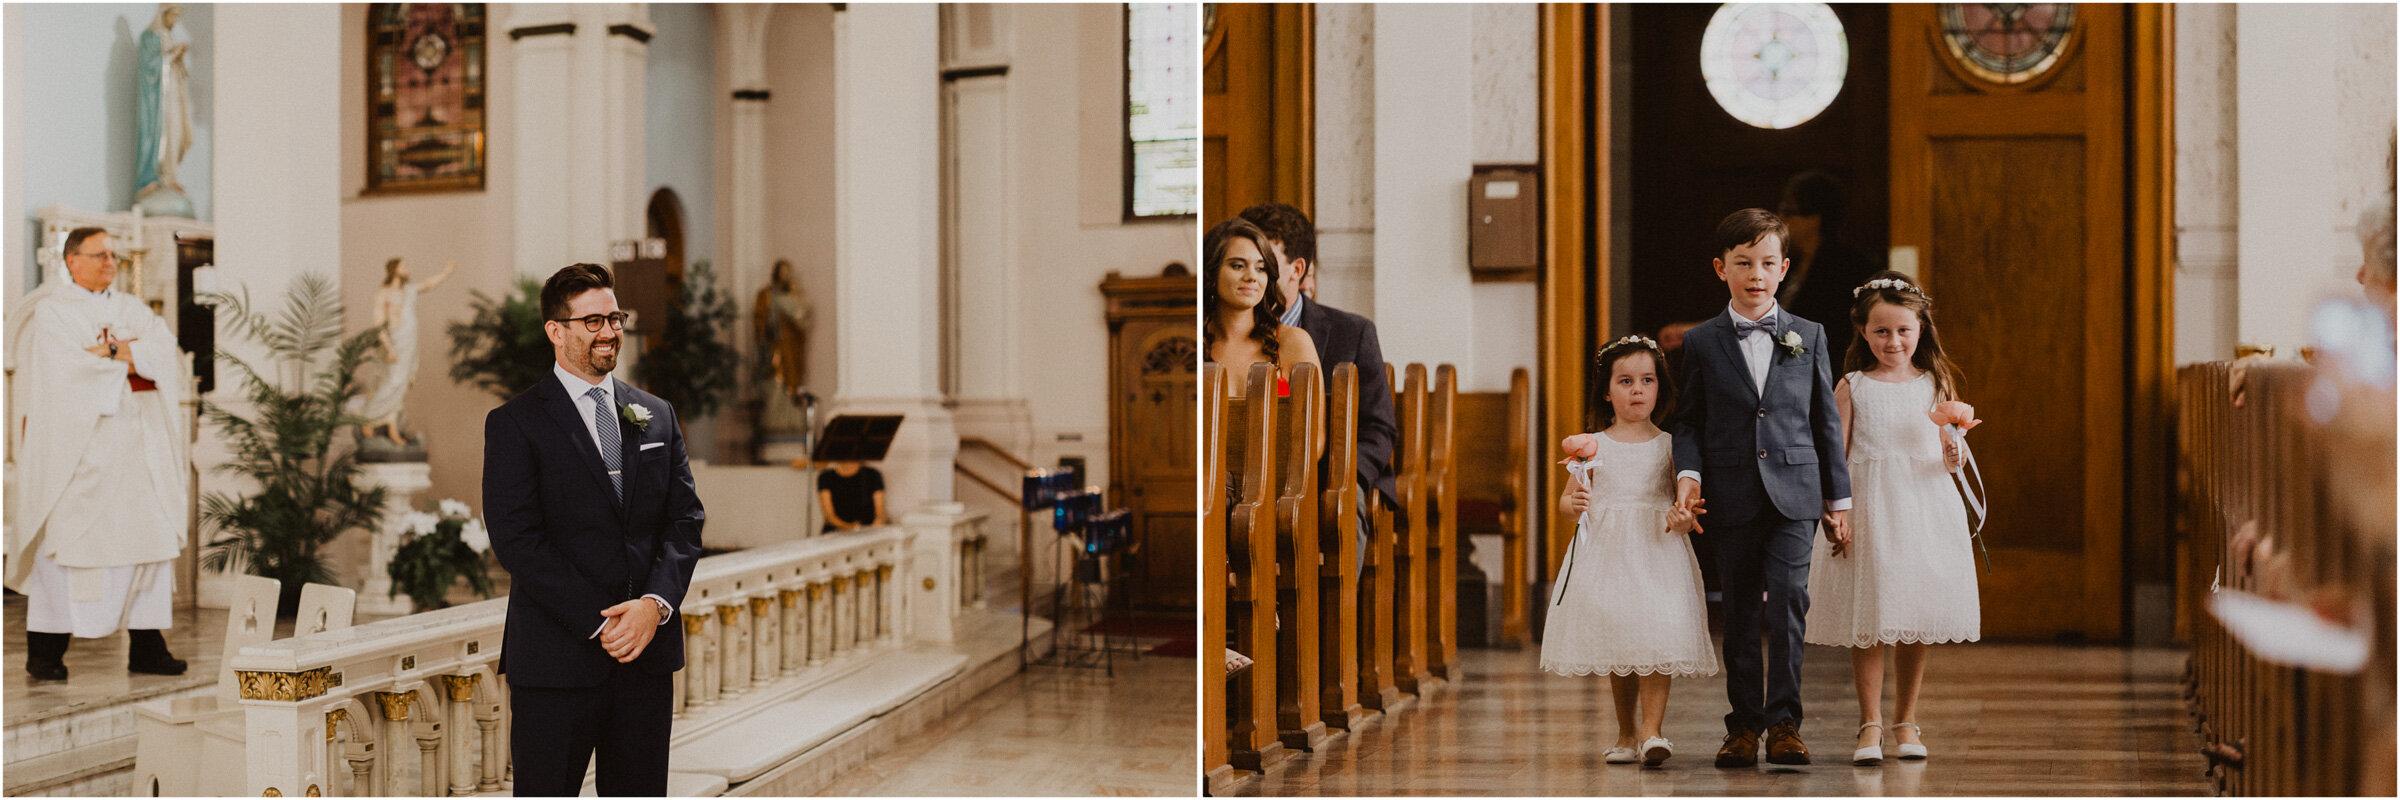 alyssa barletter photography the abbott kansas city summer wedding-23.jpg